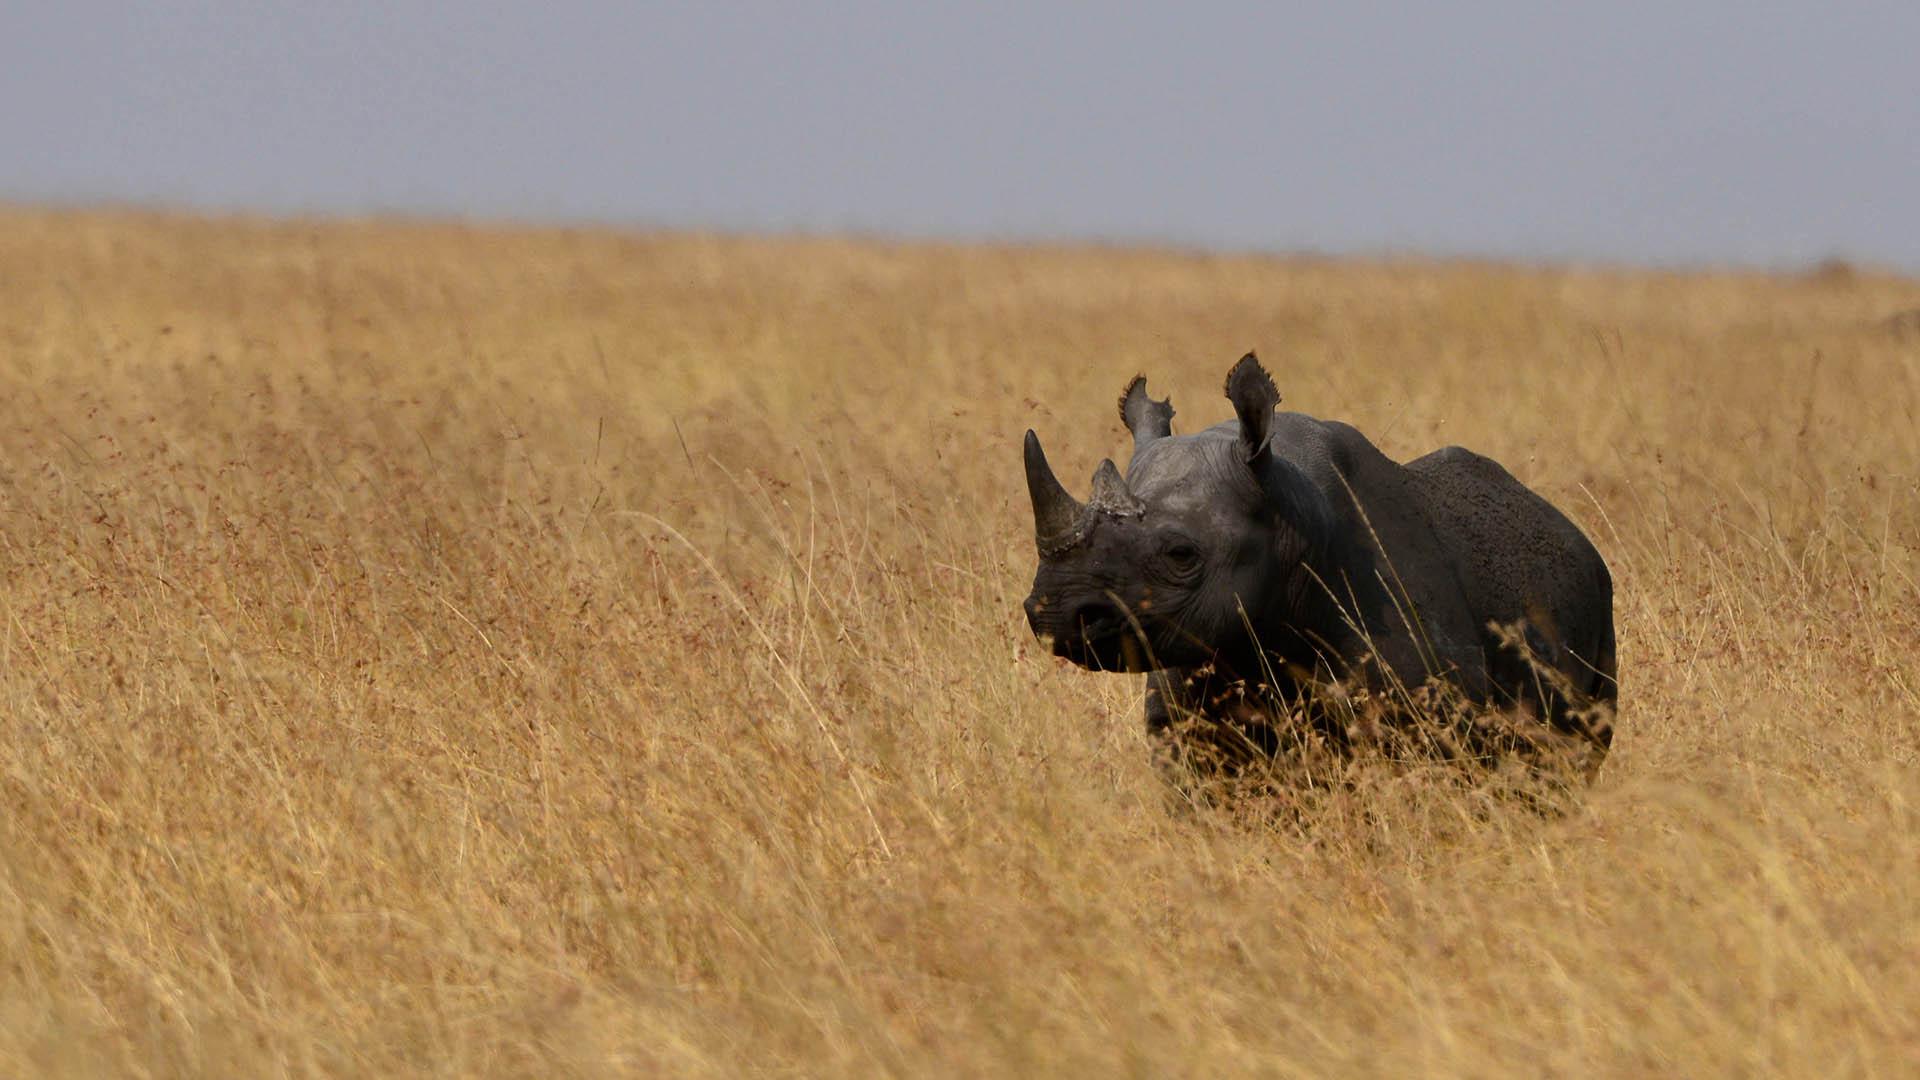 contact-Nasikia-camps-moru-rhino-serengeti-migration-destinations-nasikia-camps-tours-tanzania-safaris-africa